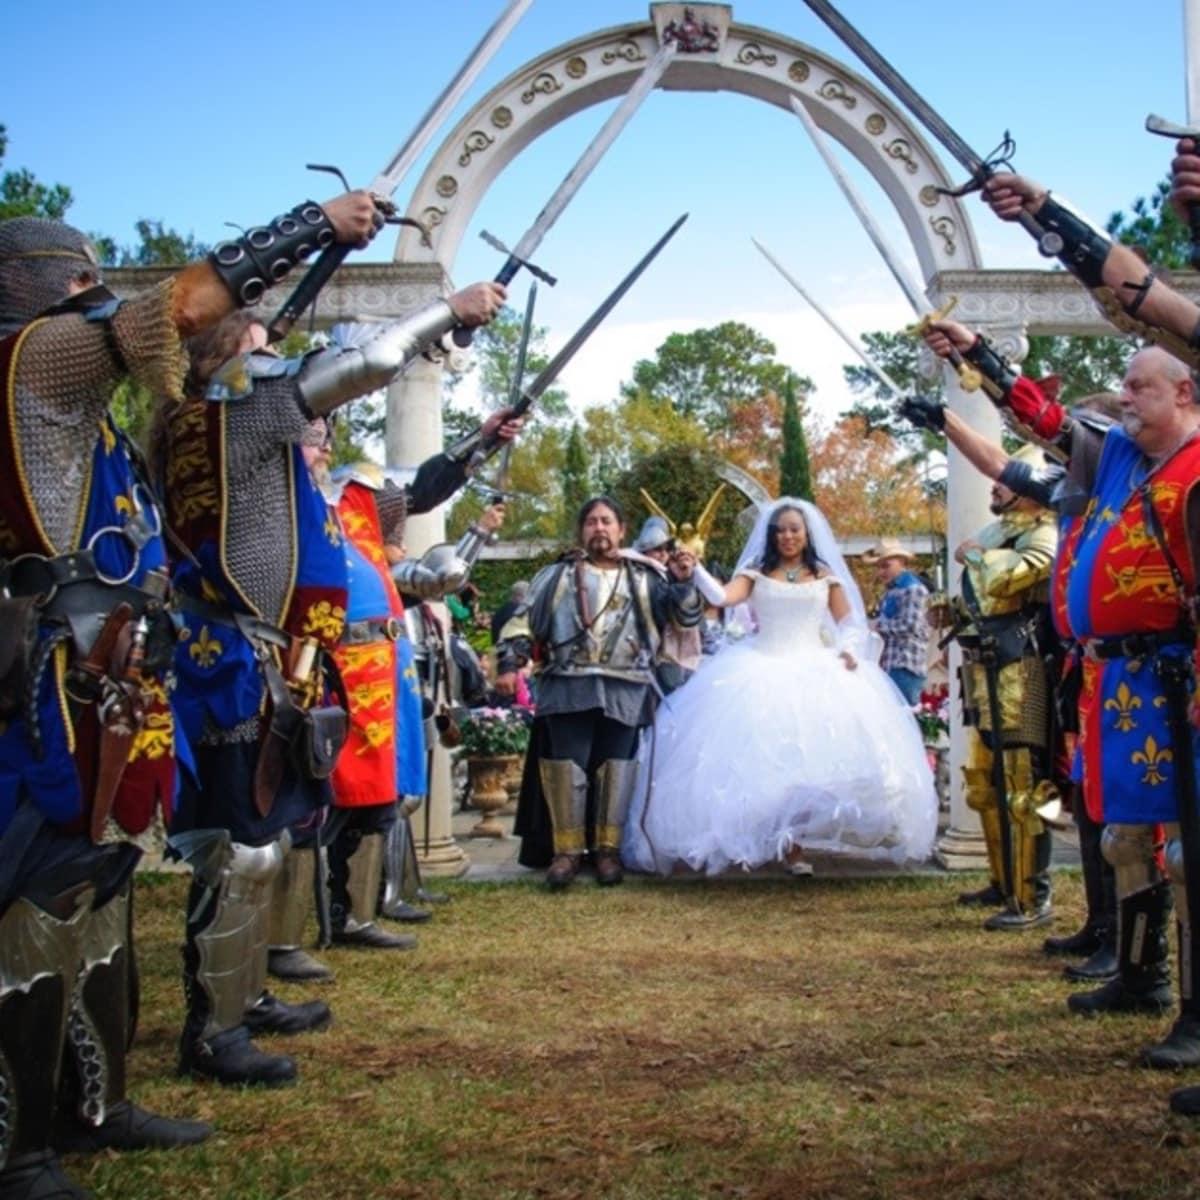 Texas Renaissance Festival wedding